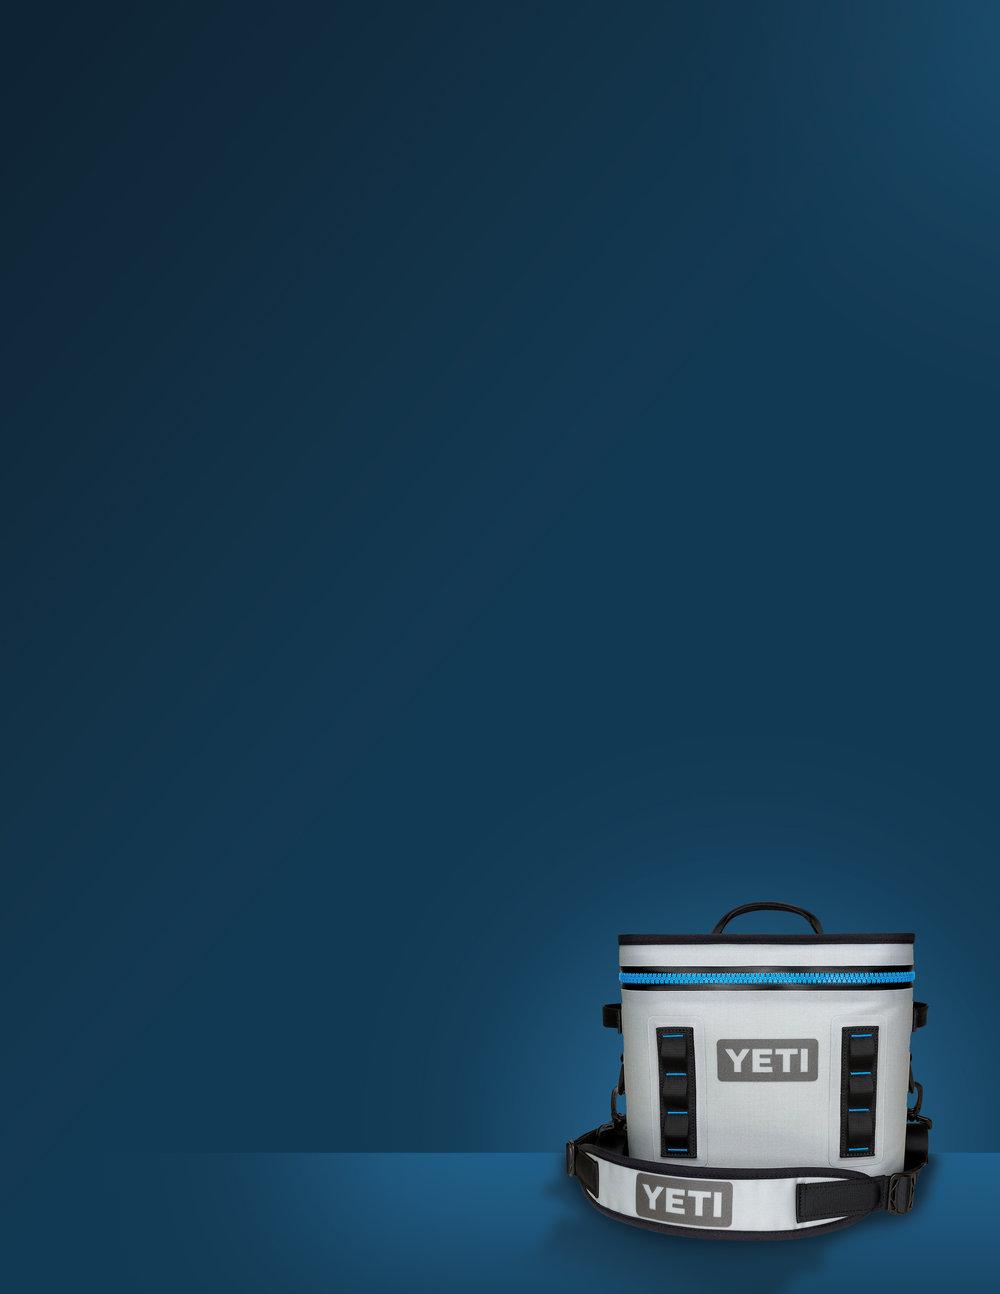 YETI Coolers Print